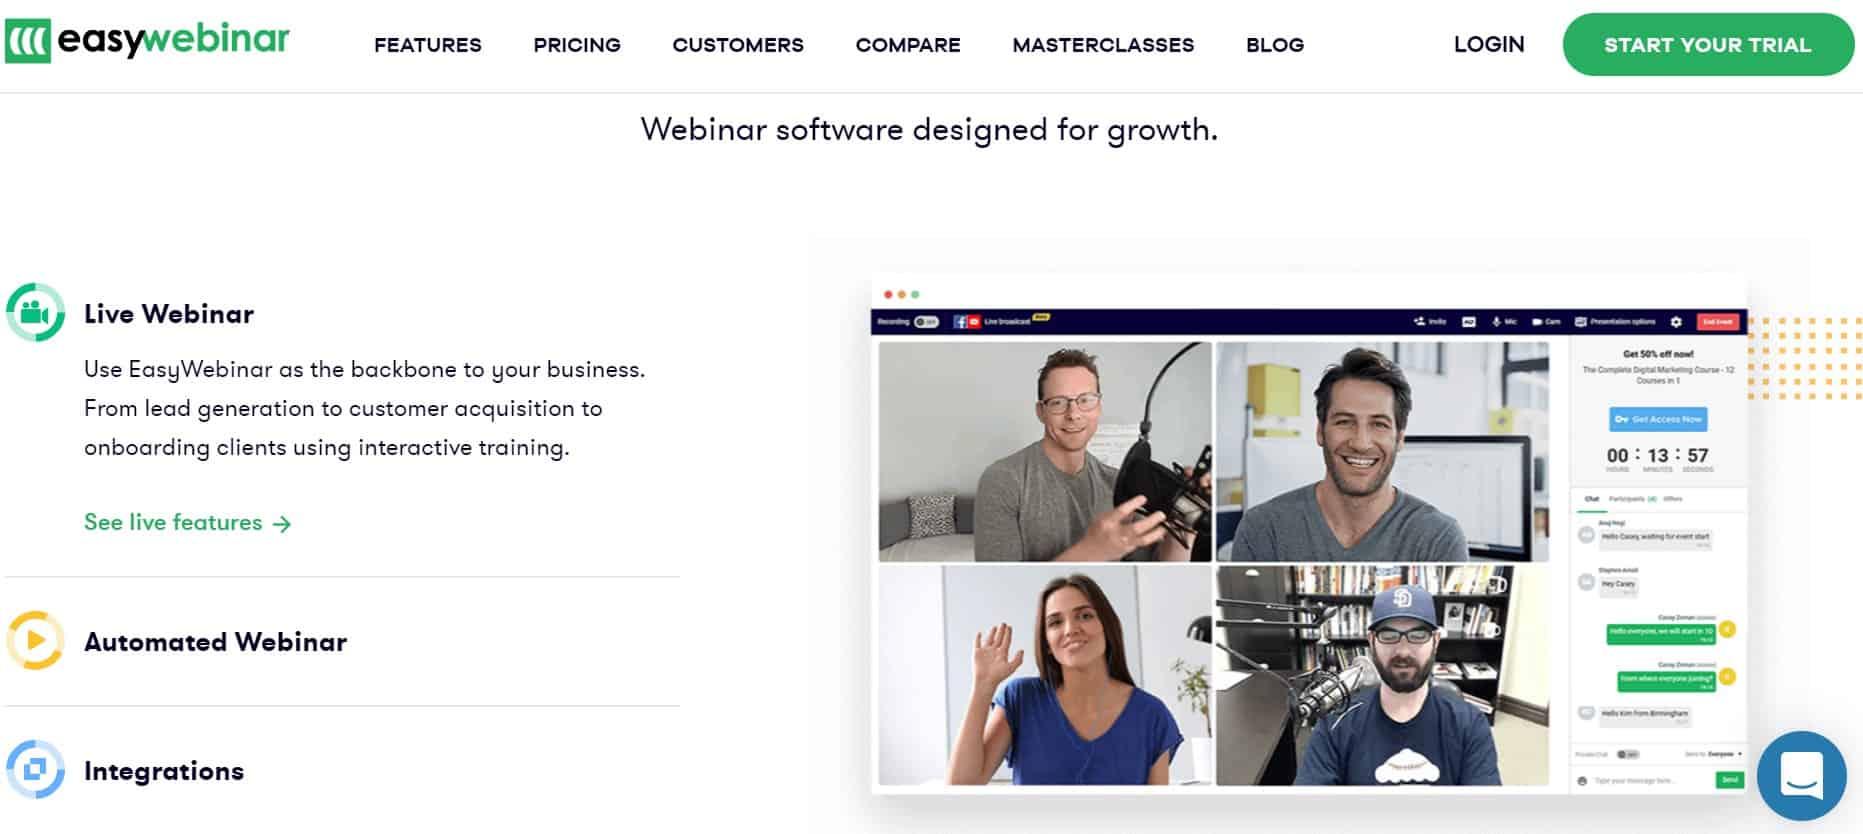 EasyWebinar – Easywebinar pricing, Easywebinar review